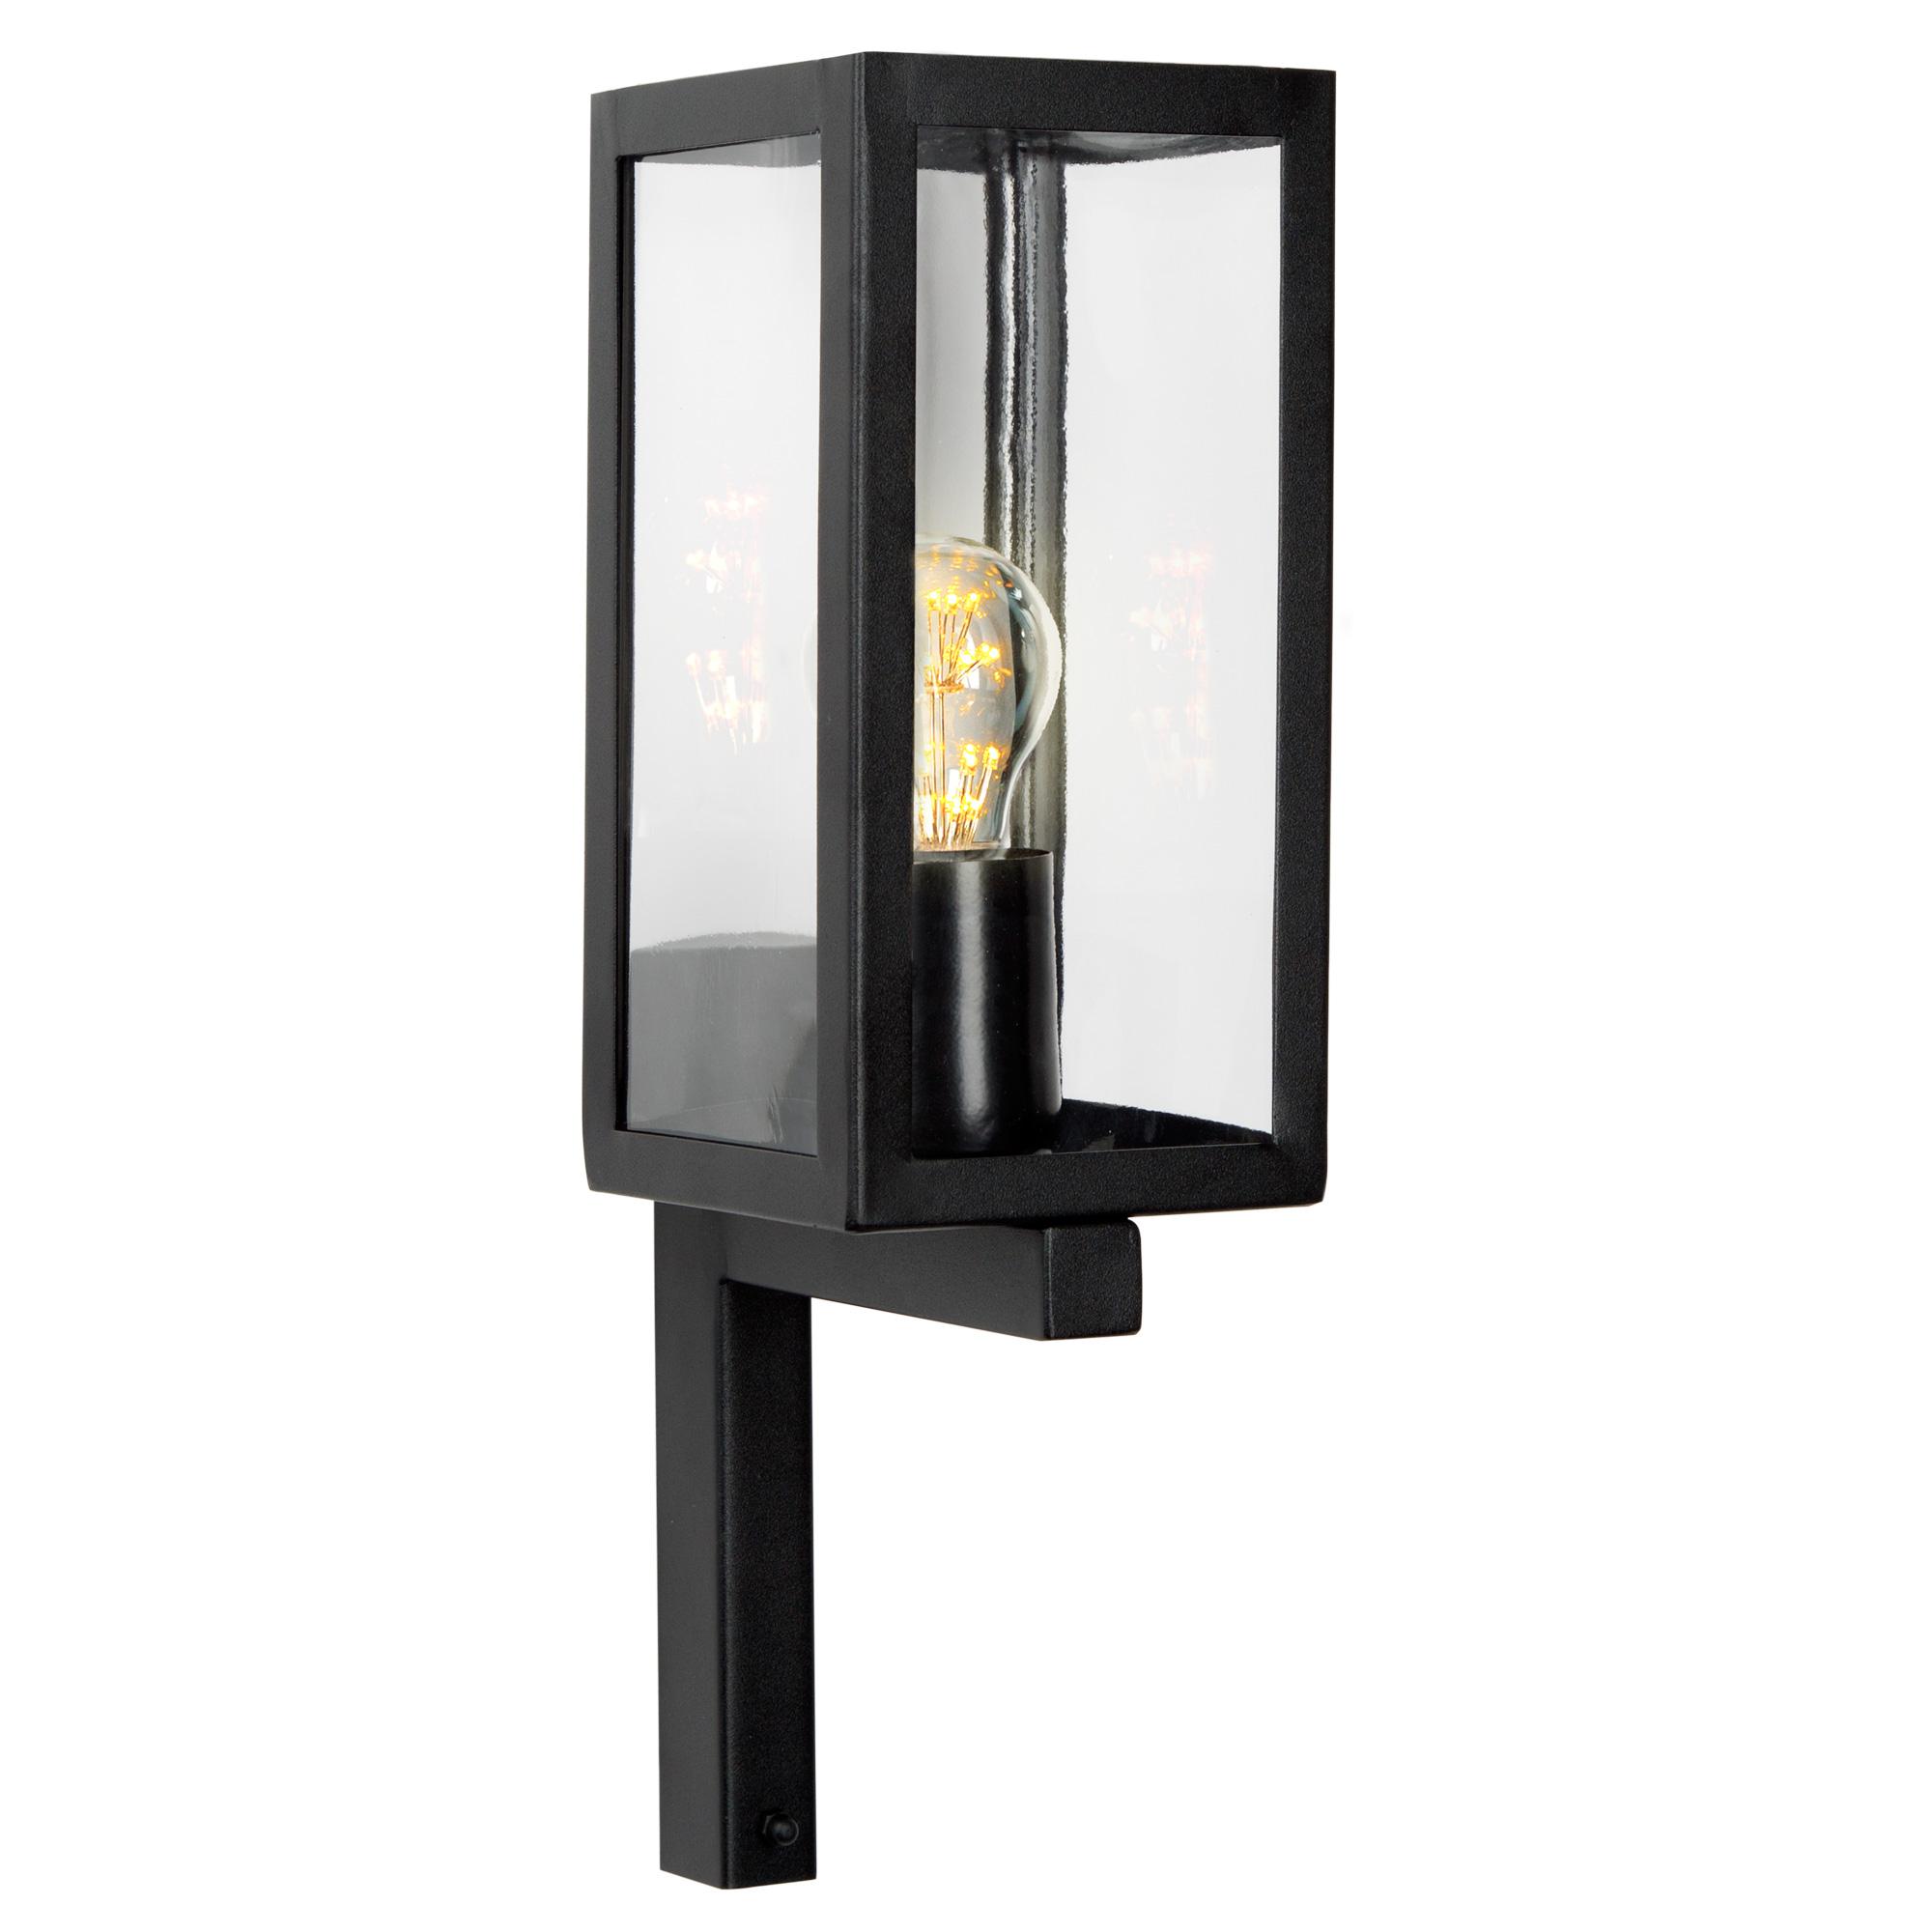 Buitenlamp Huizen Wandlamp Zwart